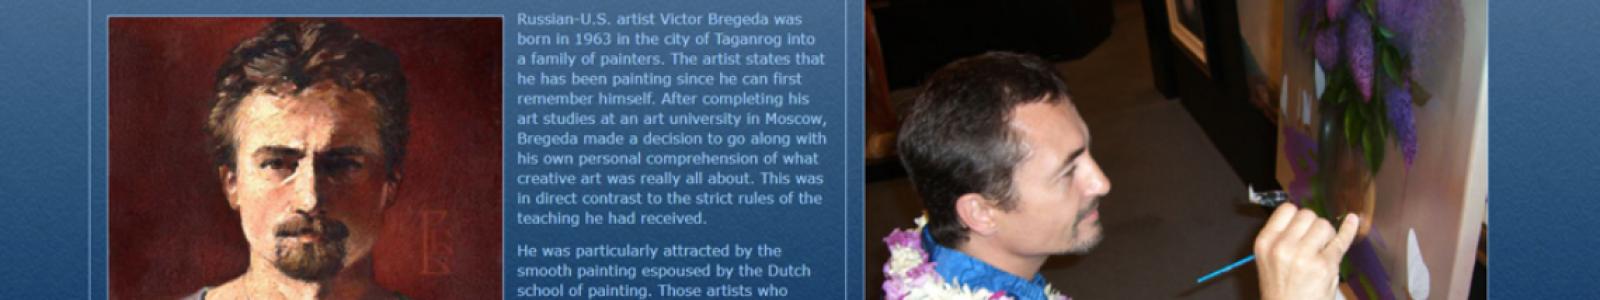 Gallery Painter Victor Bregeda